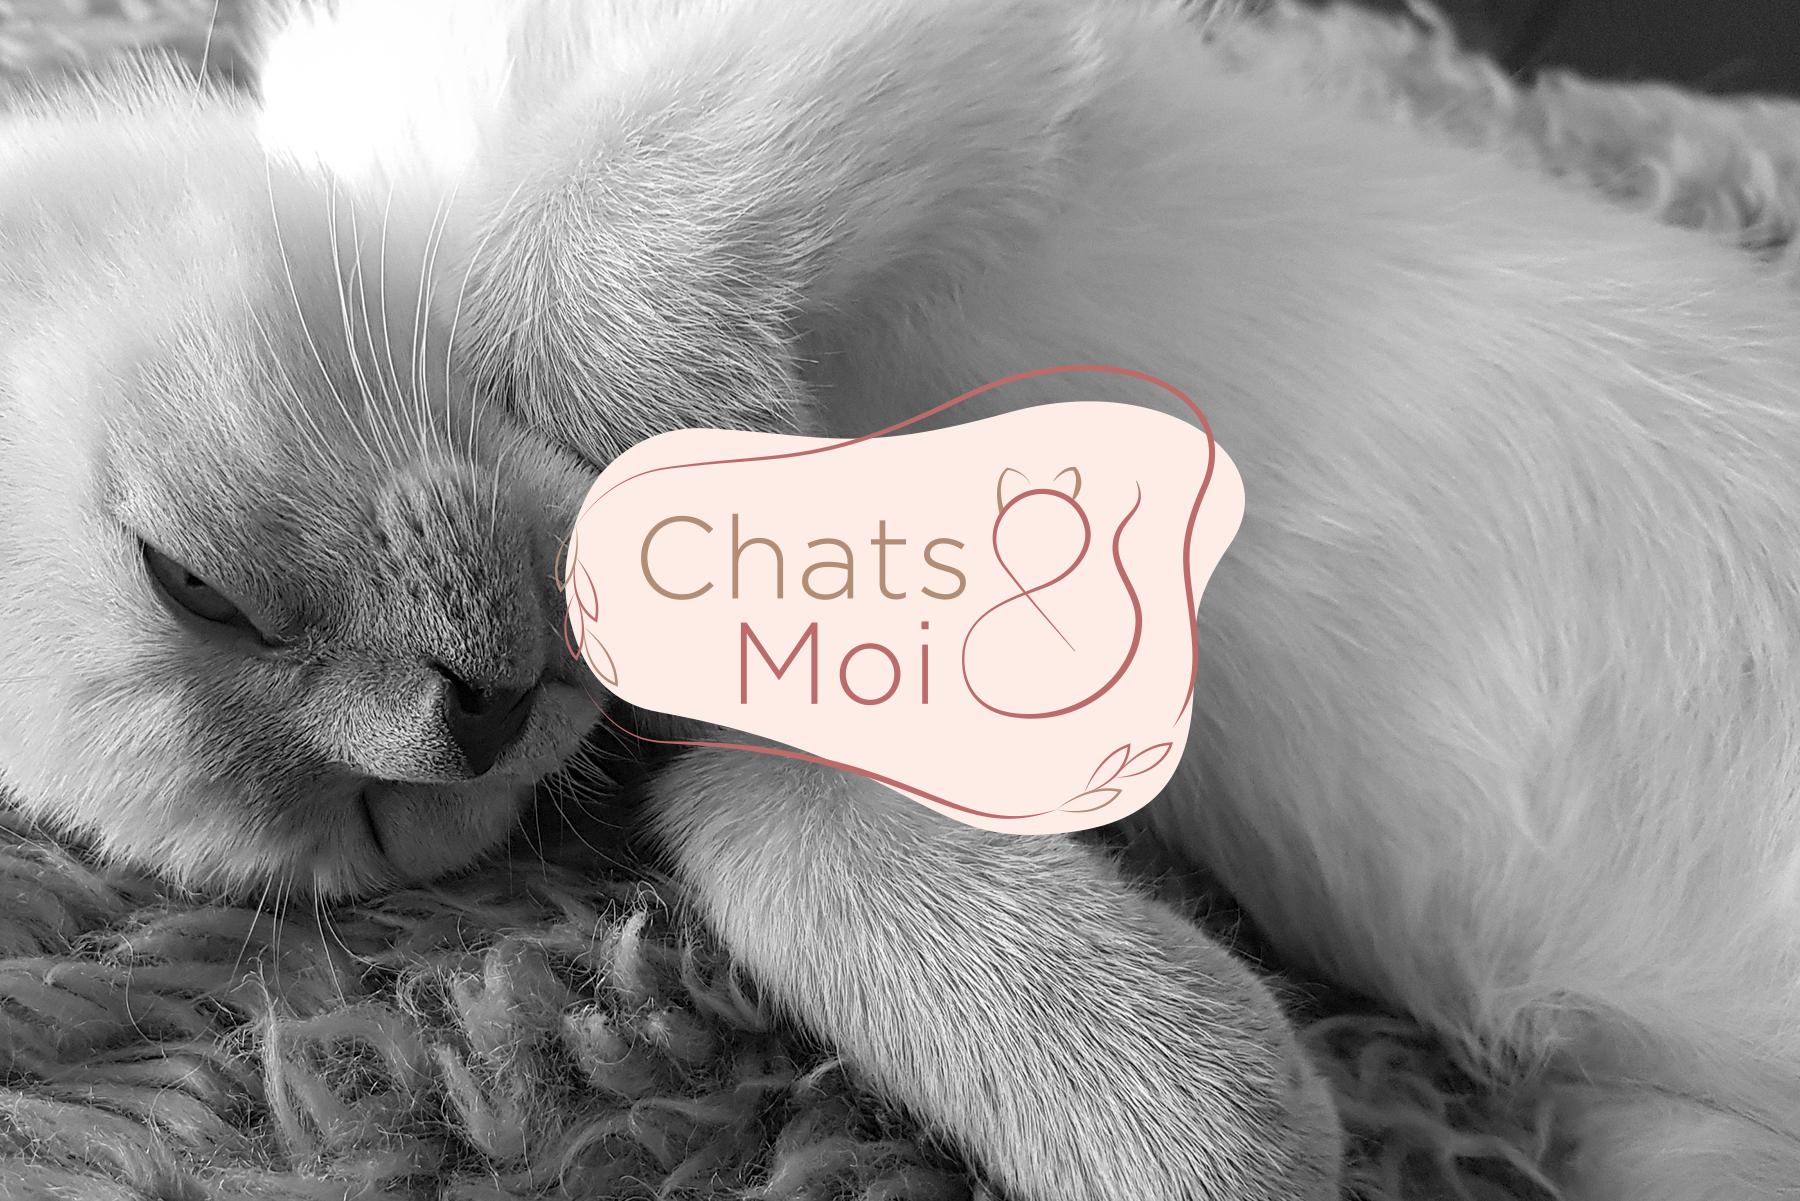 Chats&Moi